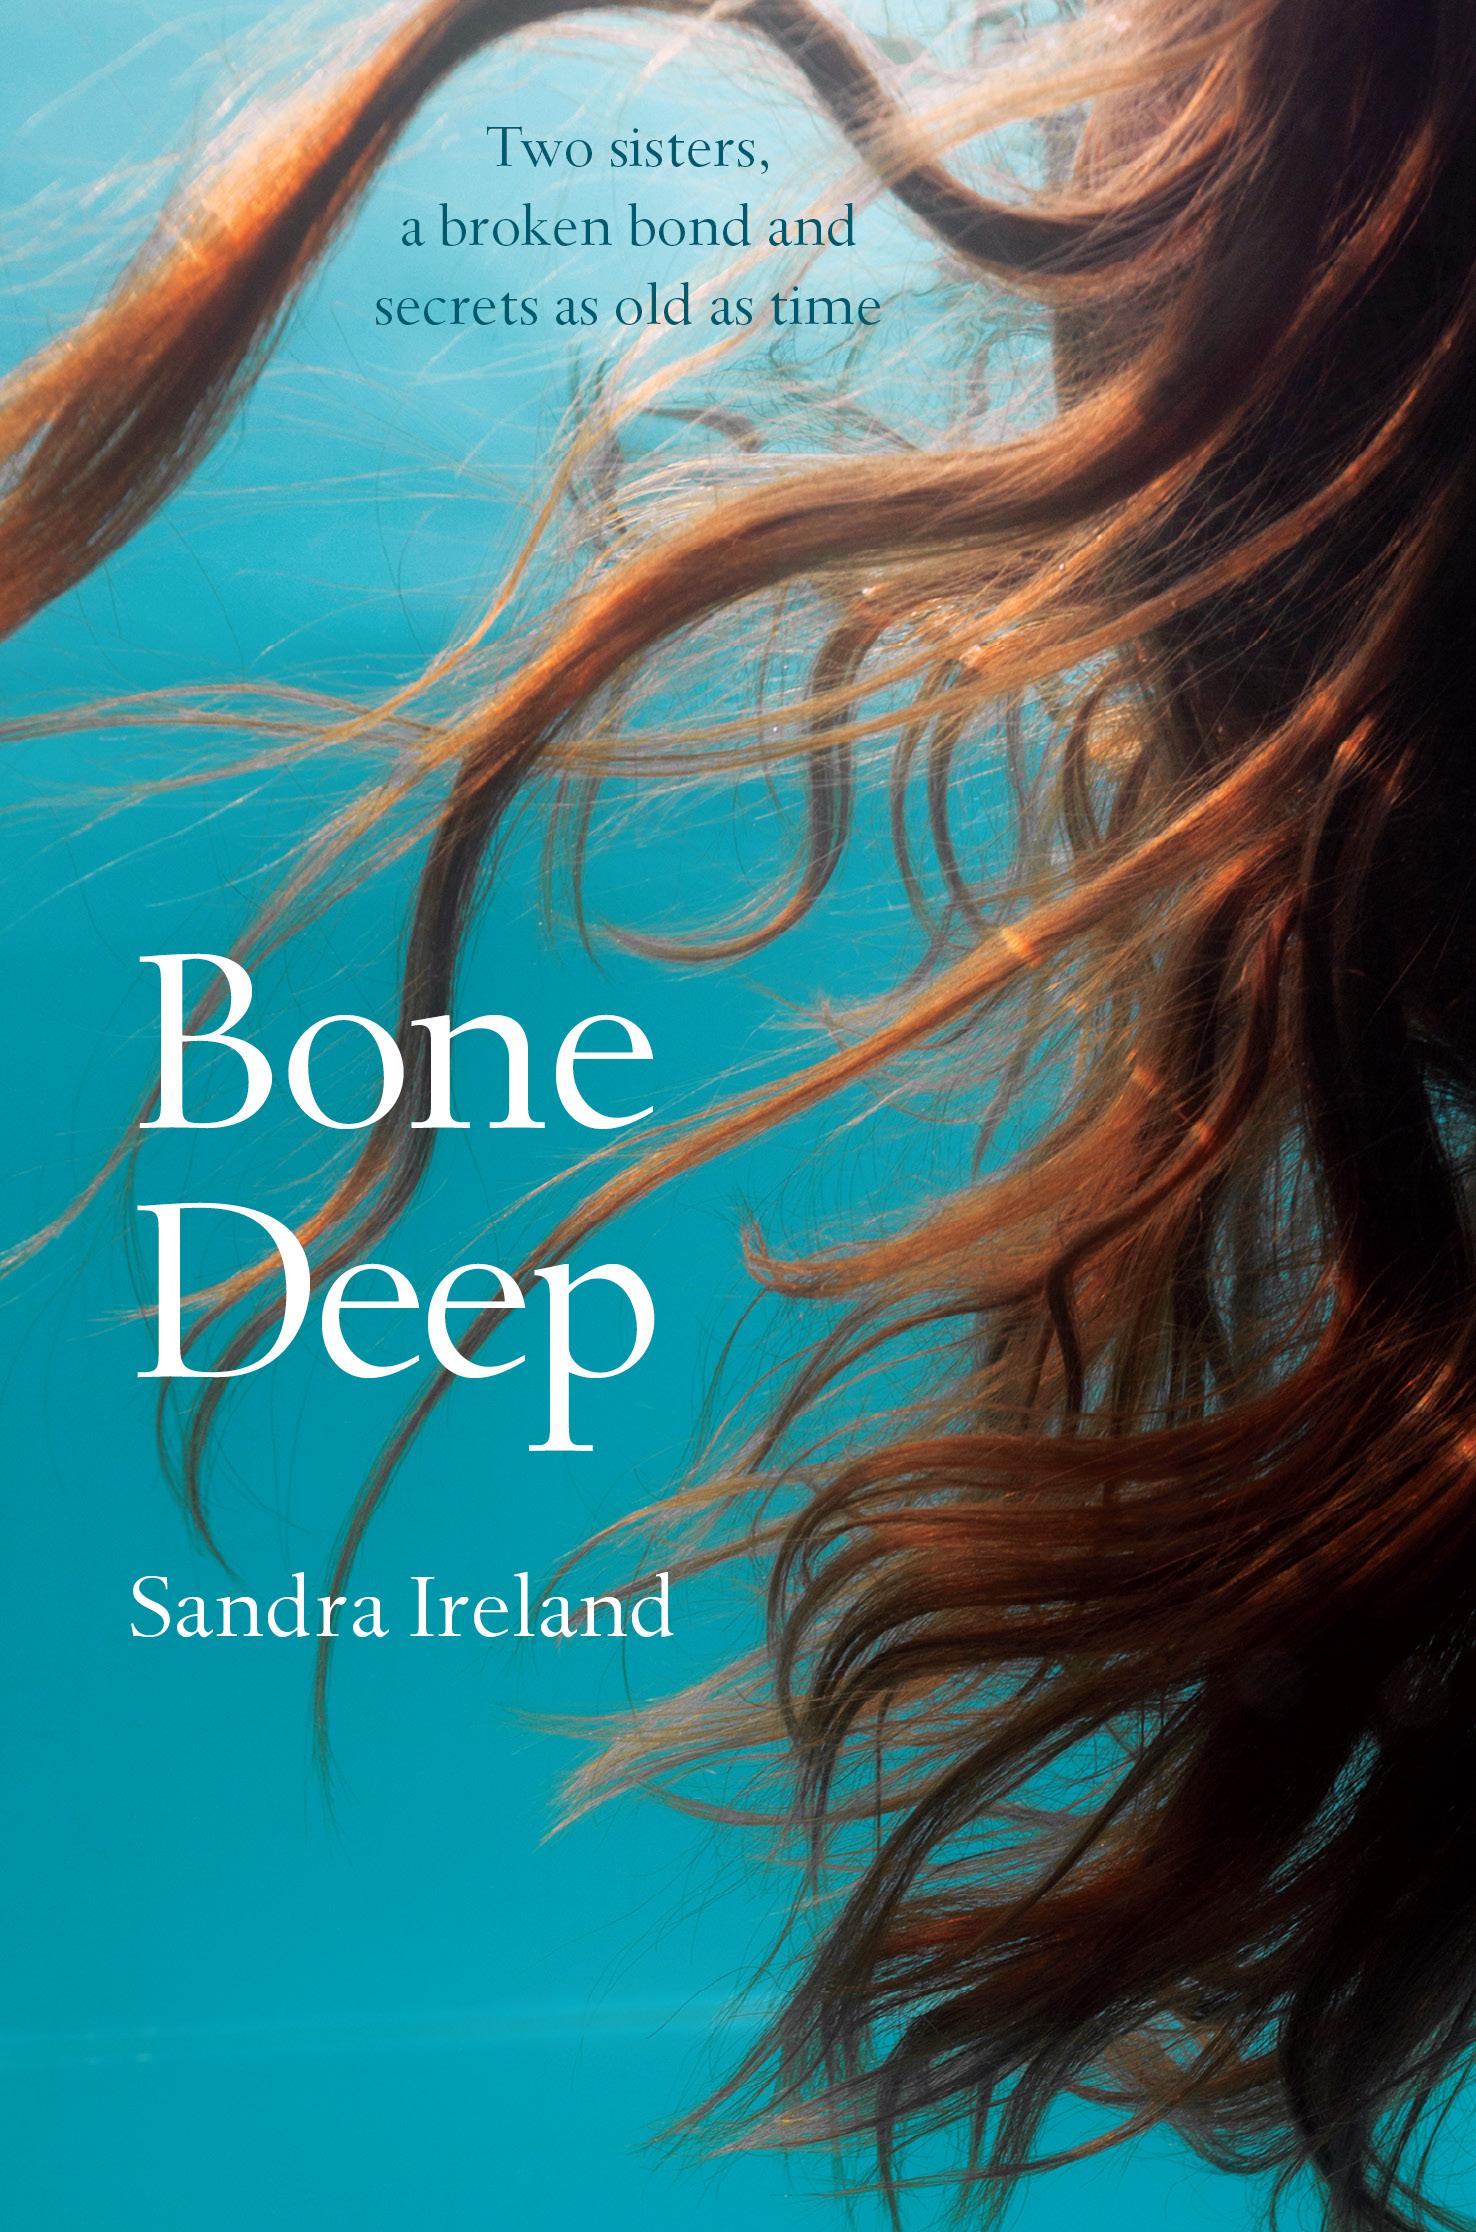 #BookReview of Bone Deep by Sandra Ireland @22_Ireland @PolygonBooks #BoneDeep #Lovebooksgrouptours